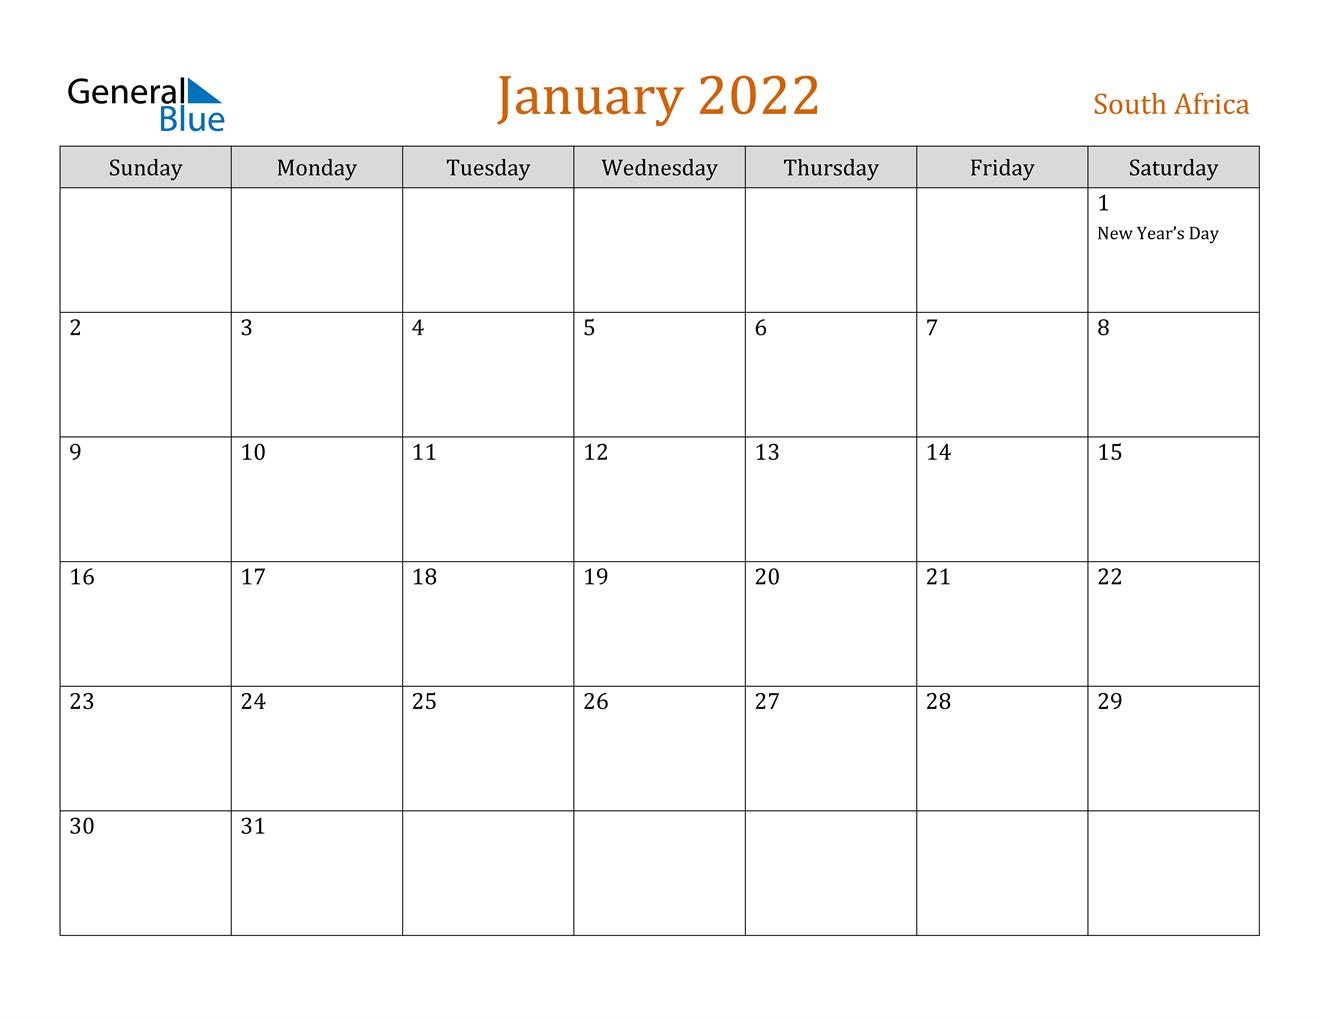 January 2022 Calendar - South Africa